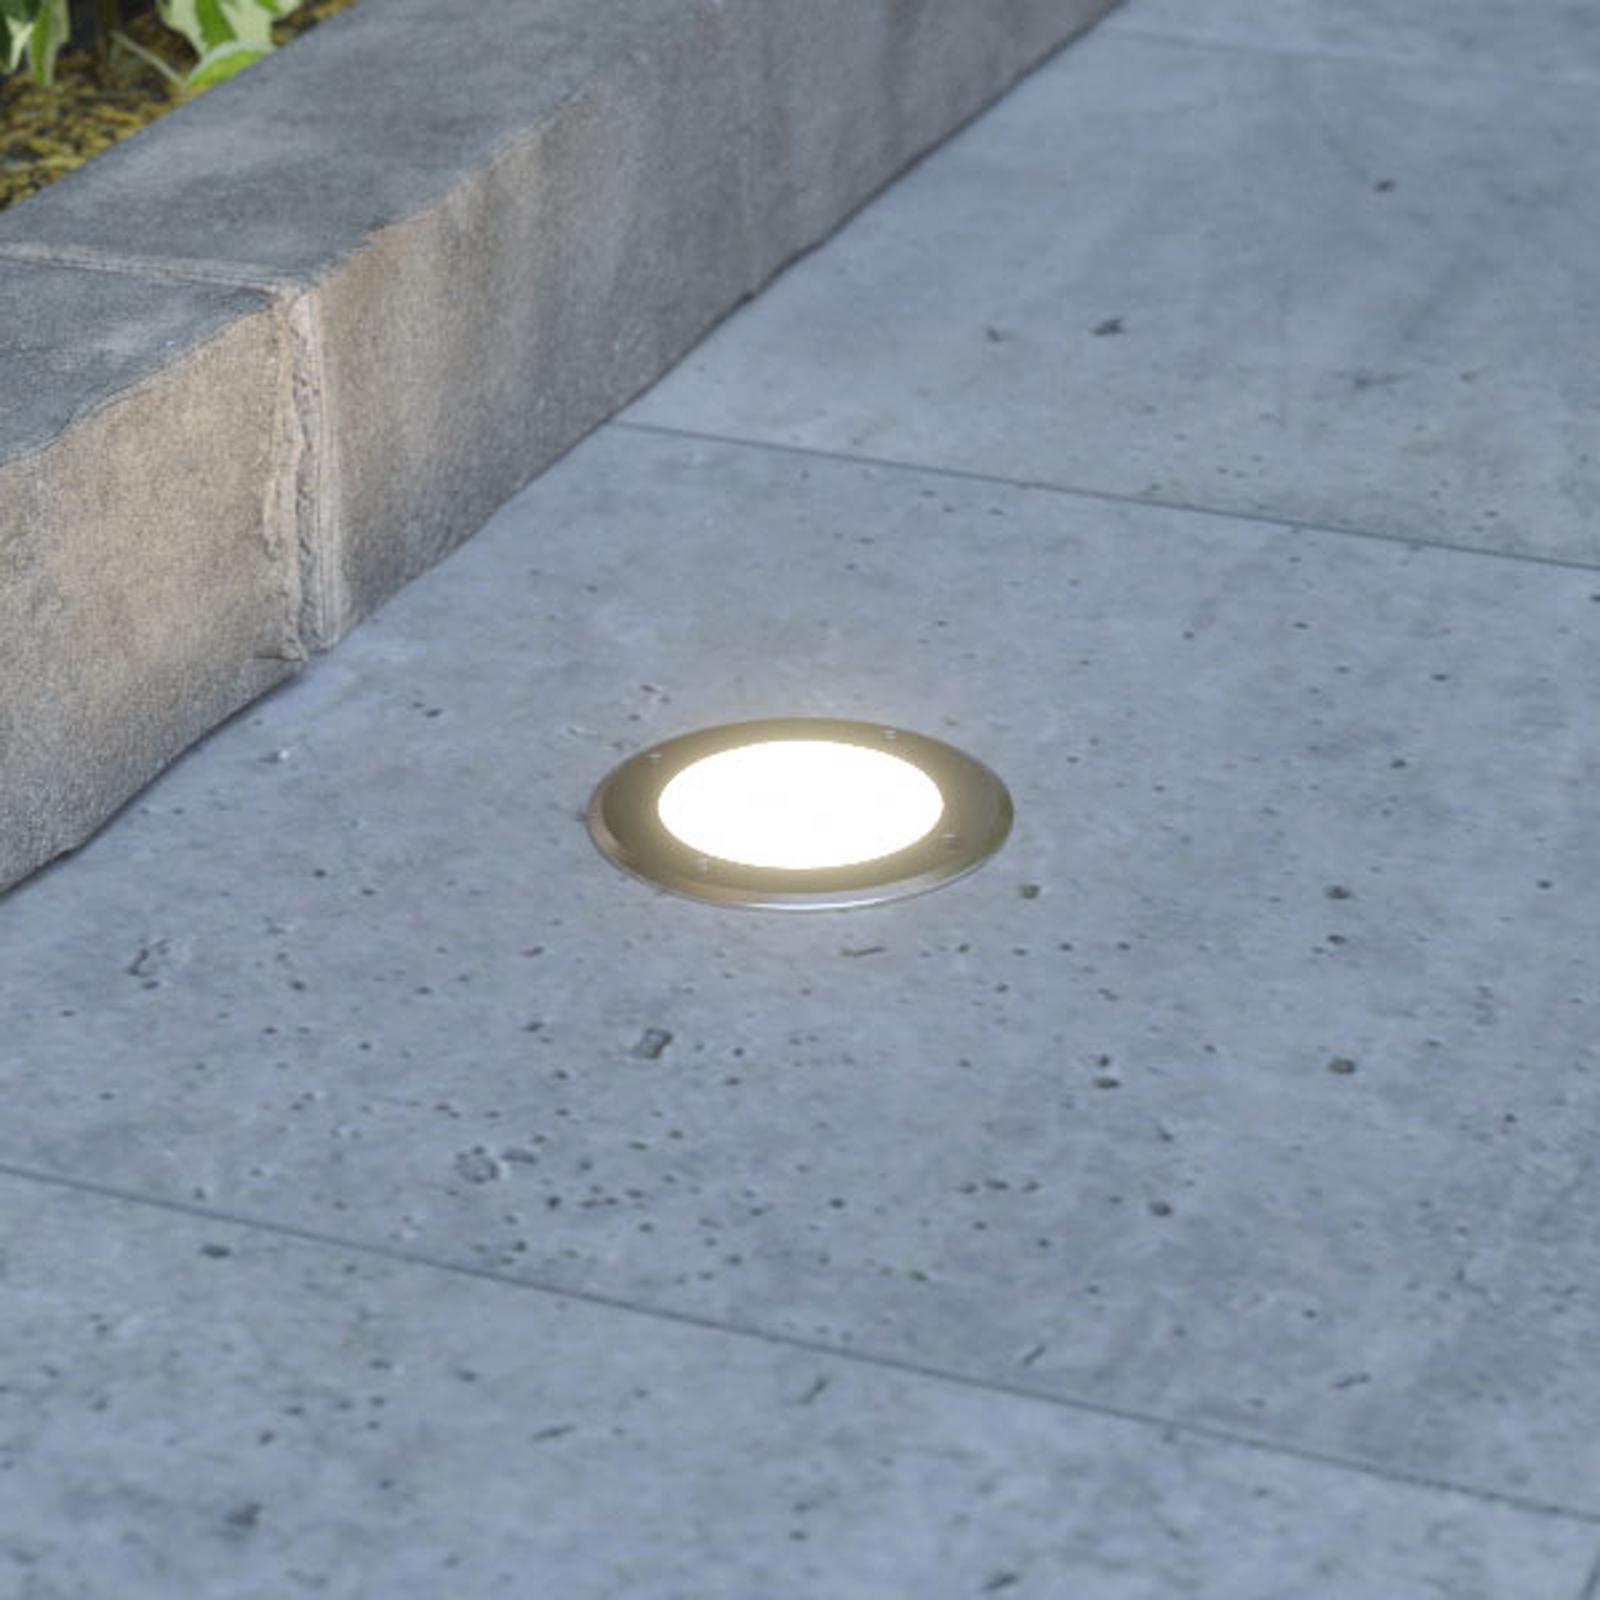 Lampada LED rotonda da interrare Doris, acciaio